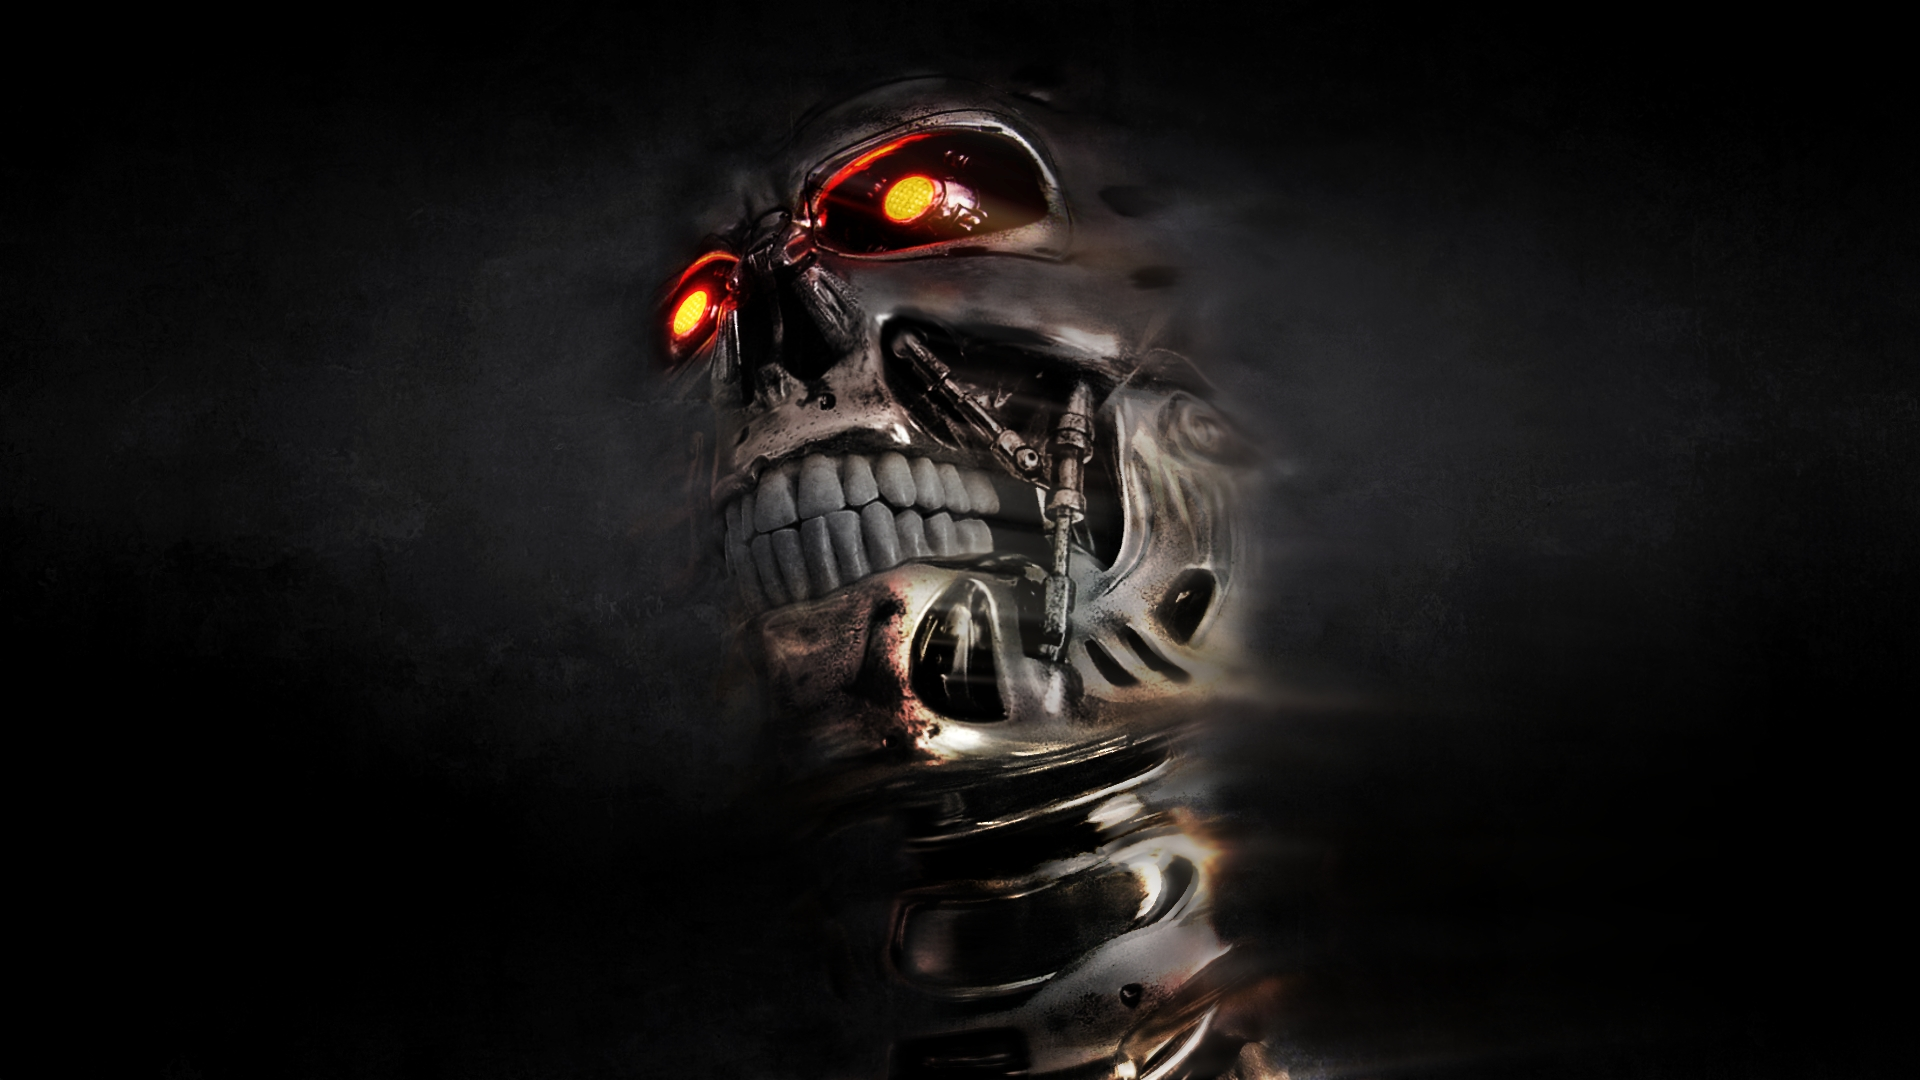 Dark Robot Wallpaper by Nick - Desktop Wallpaper